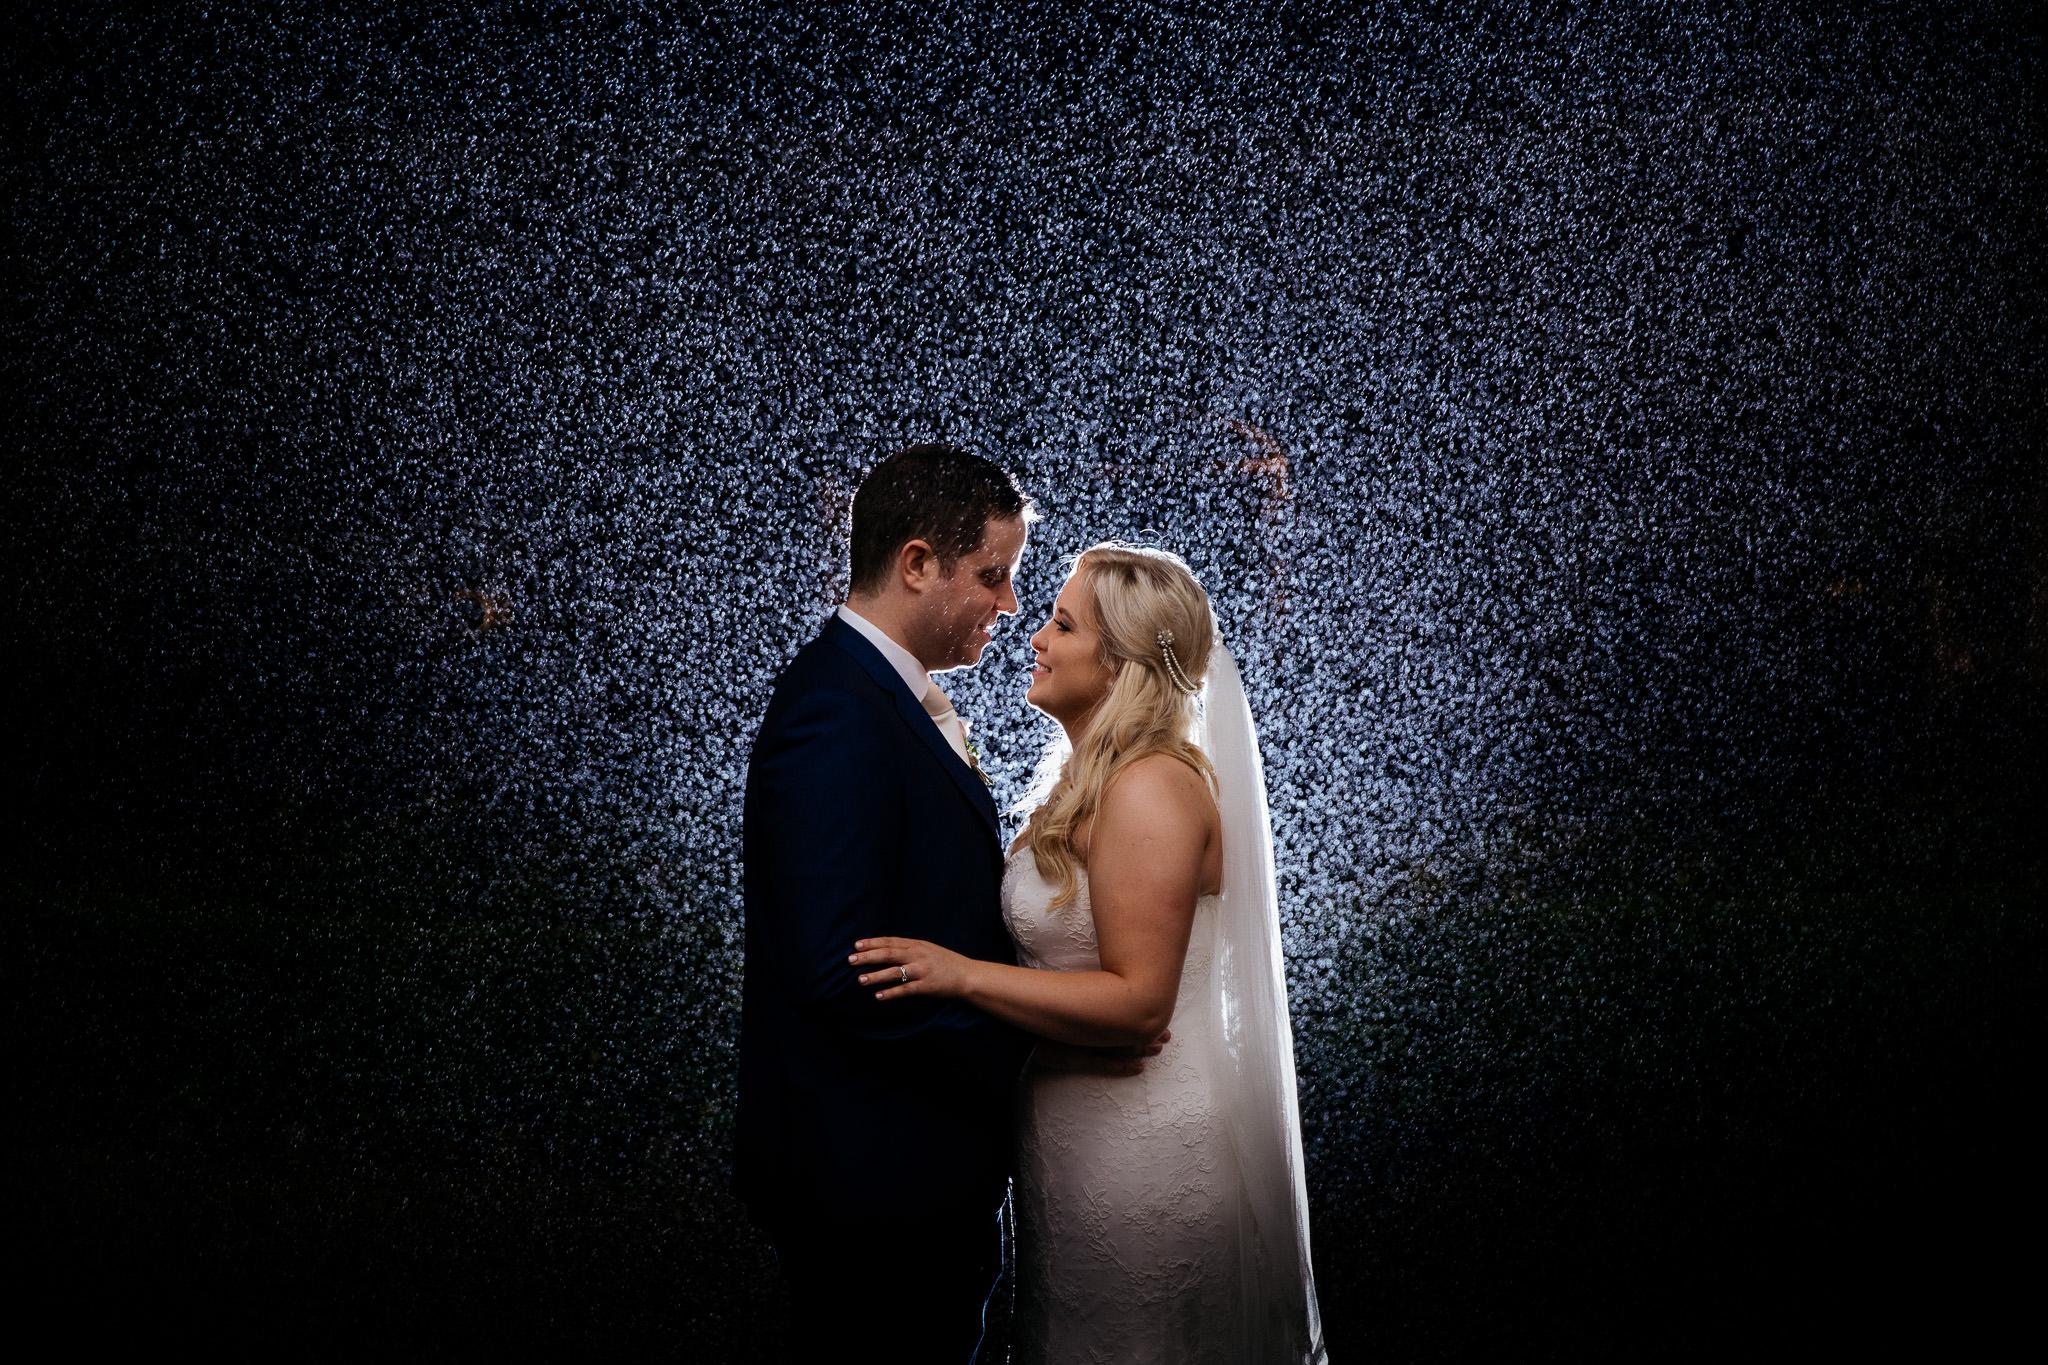 Sandra & Gearoid // Wedding // Clonabreany House